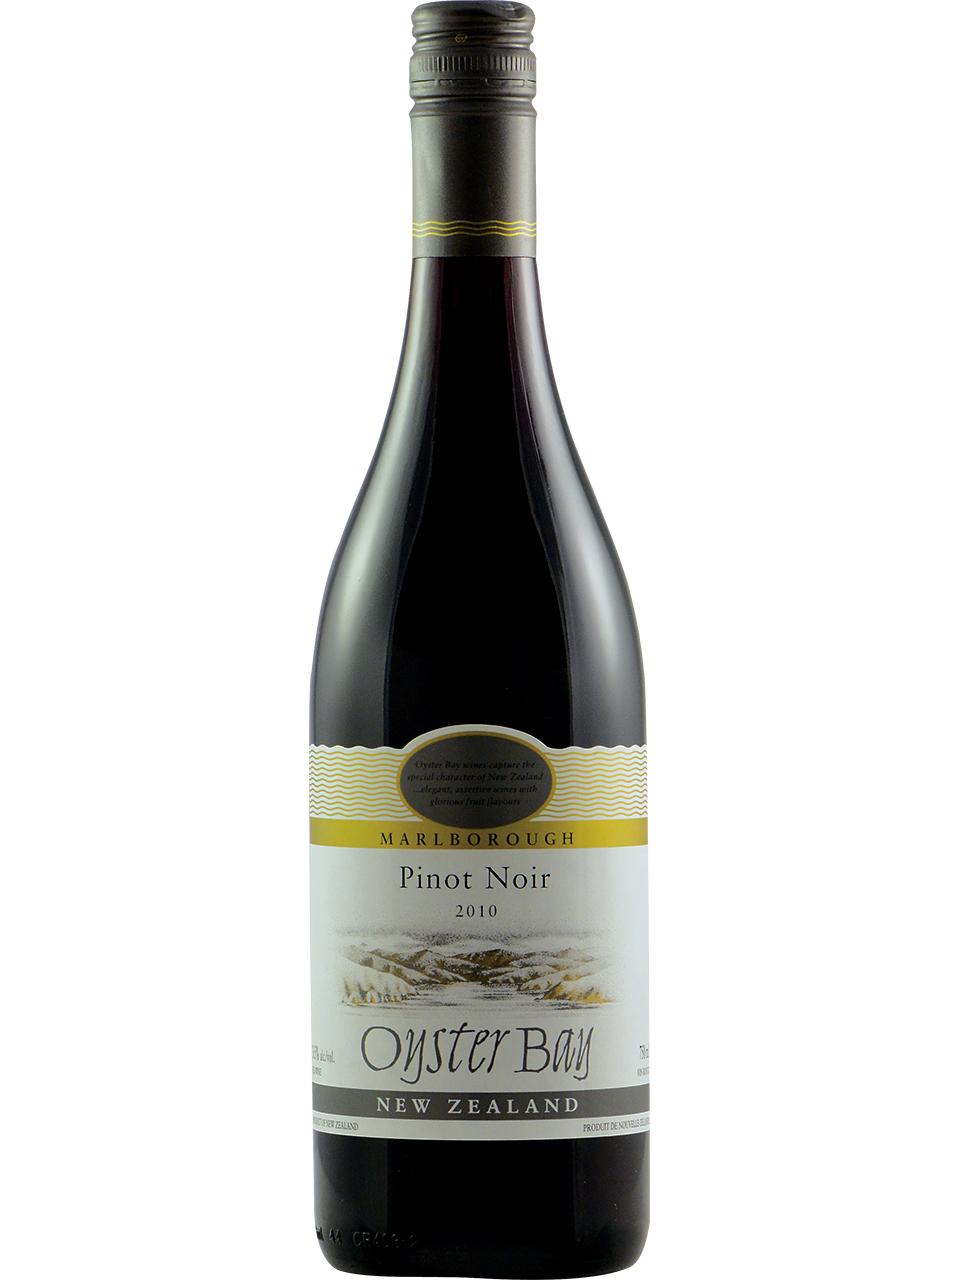 Oyster Bay Marlborough Pinot Noir